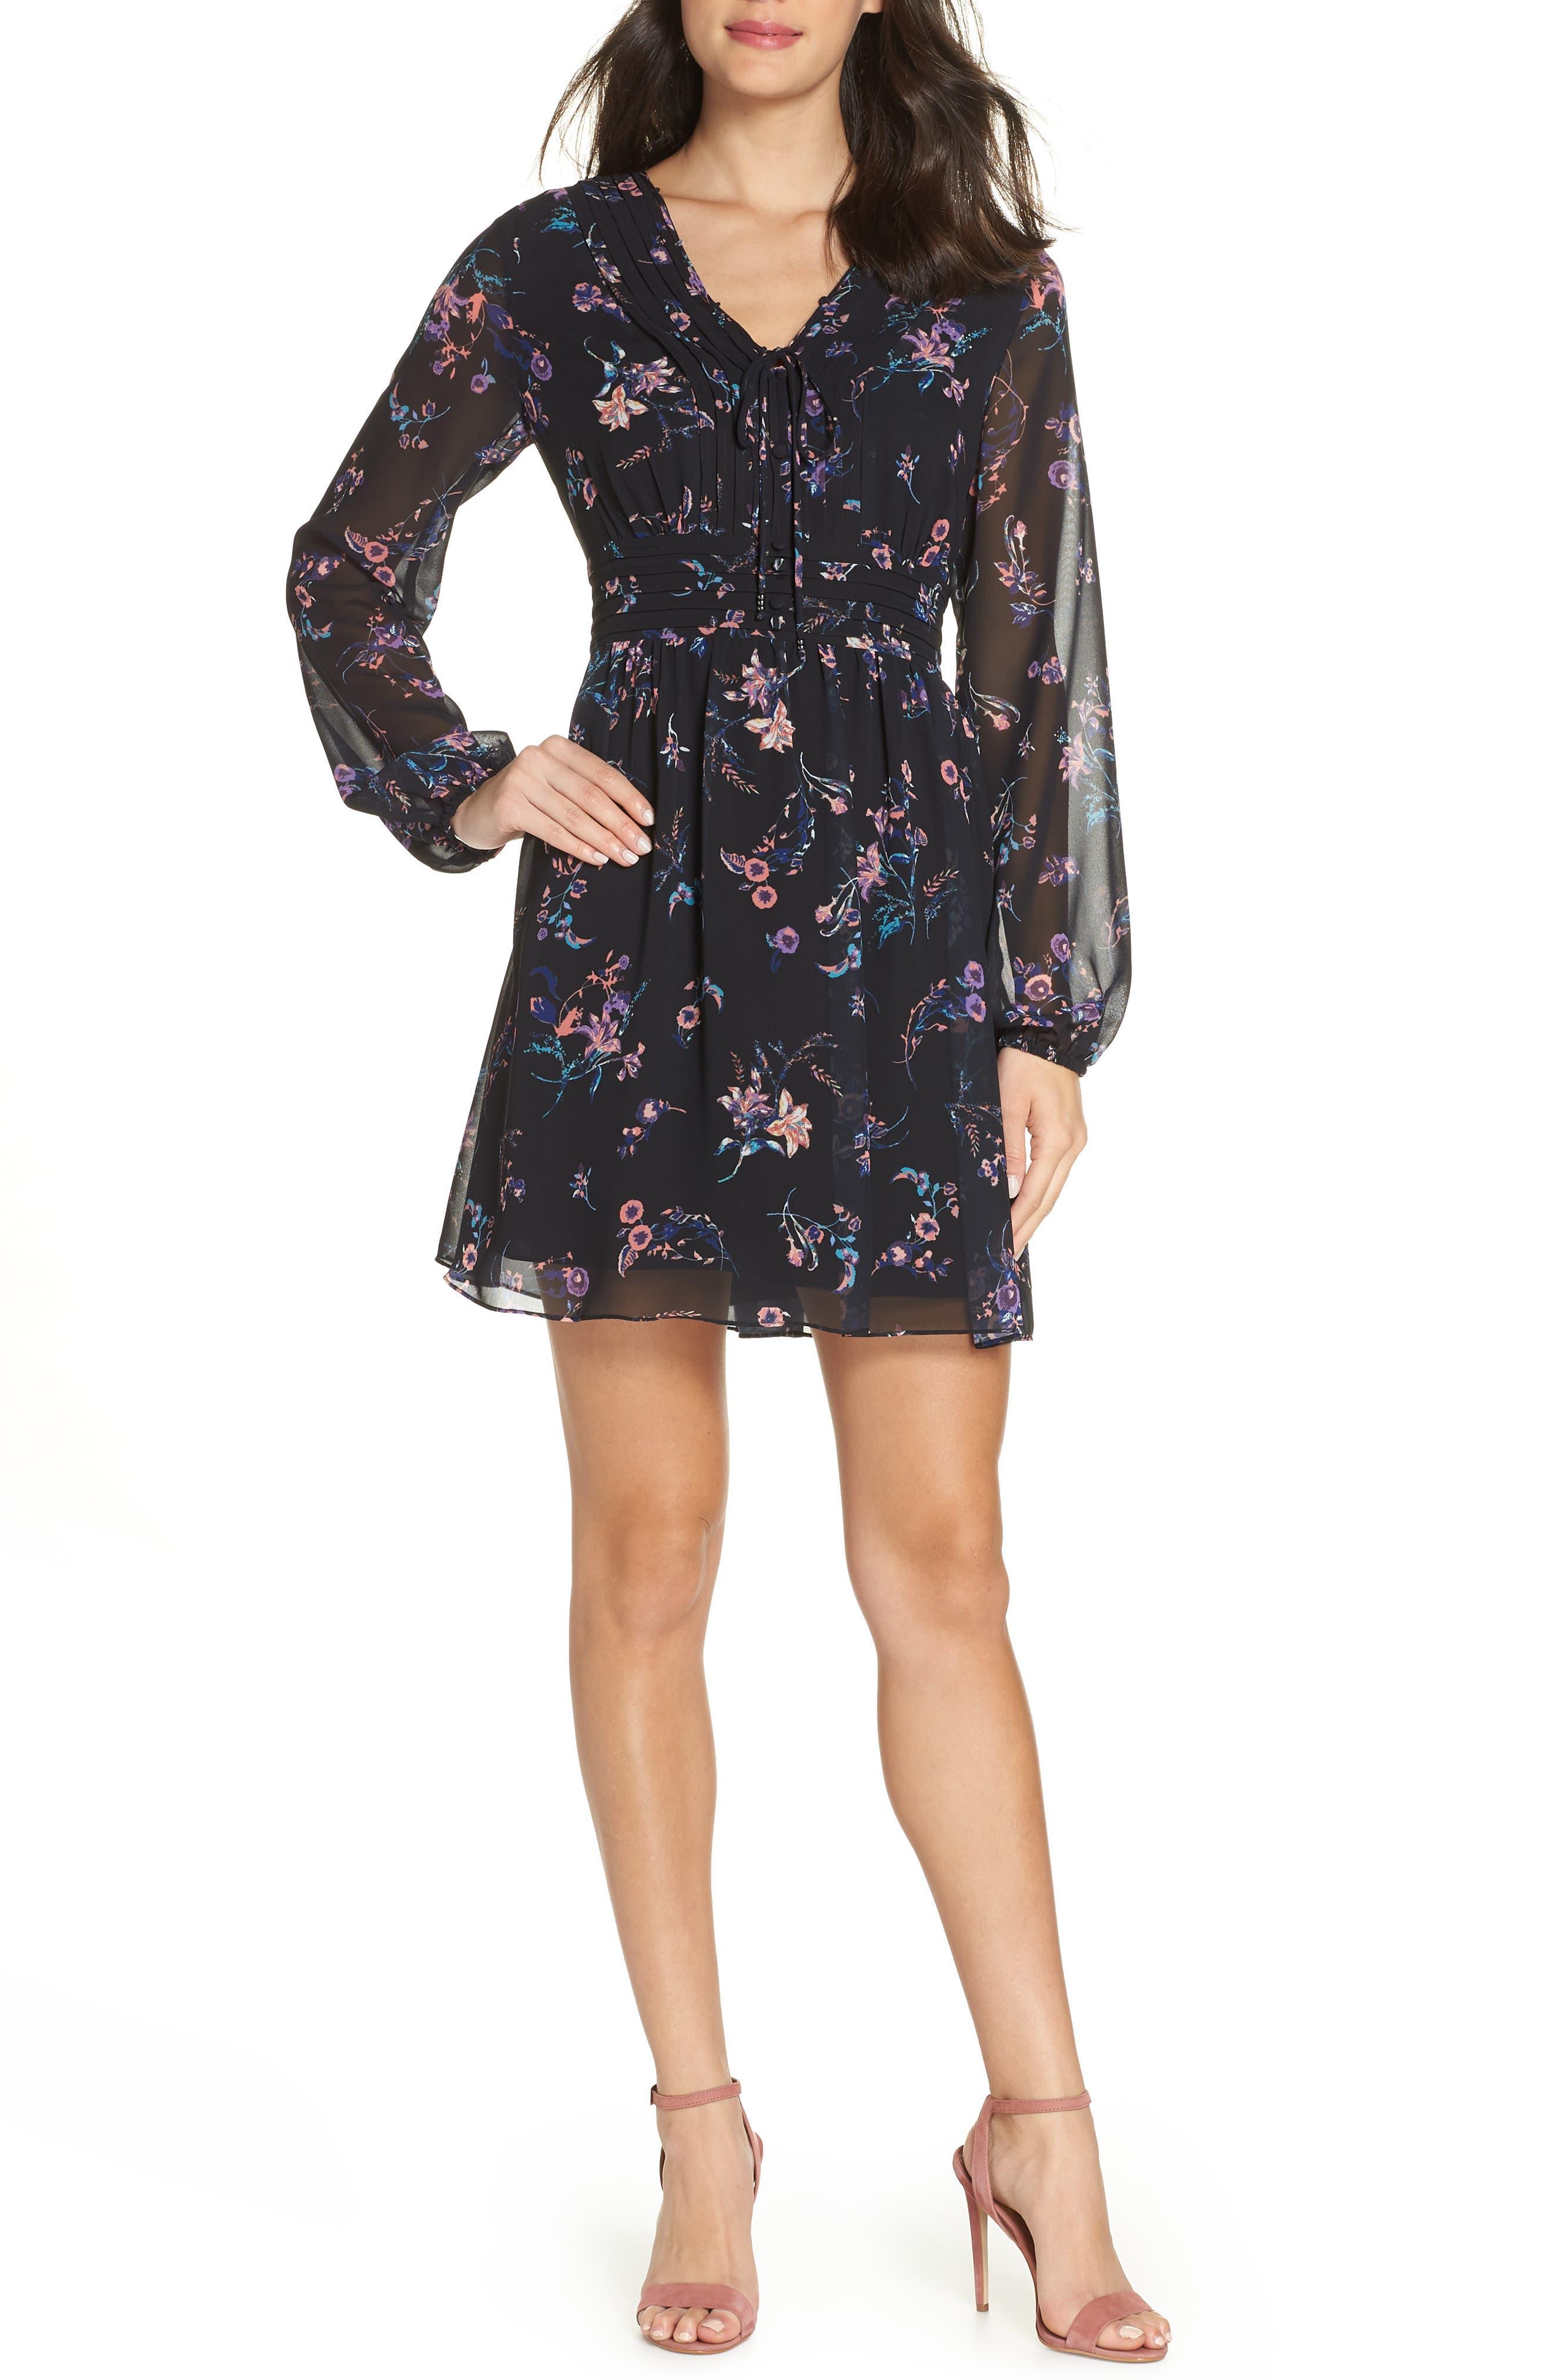 SAM EDELMAN Floral Print Dress, Main, color, 004